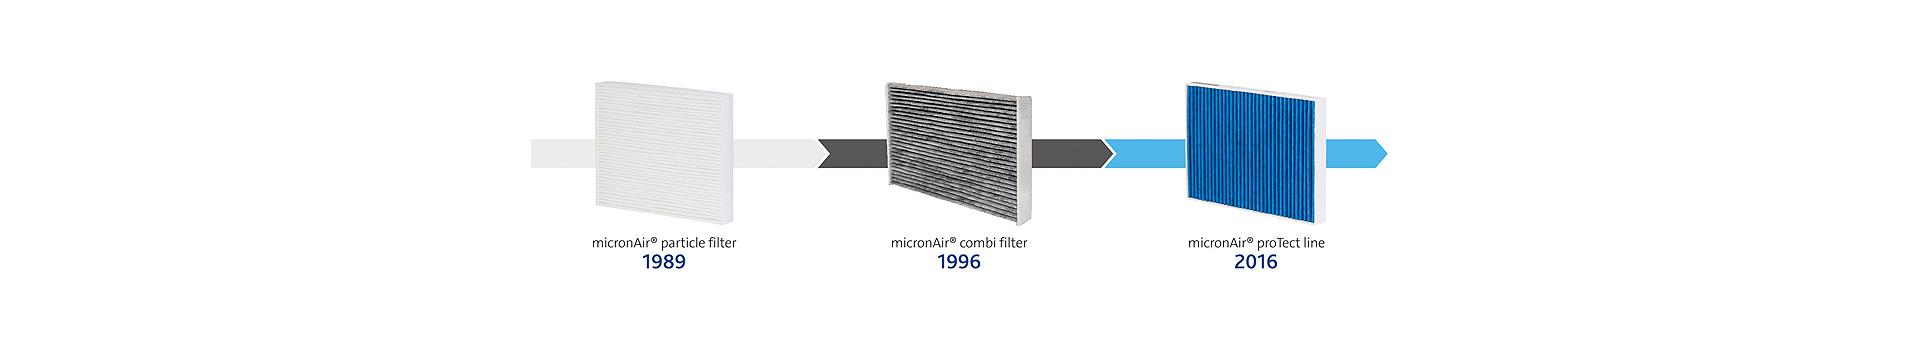 evolution of micronAir cabin air filters